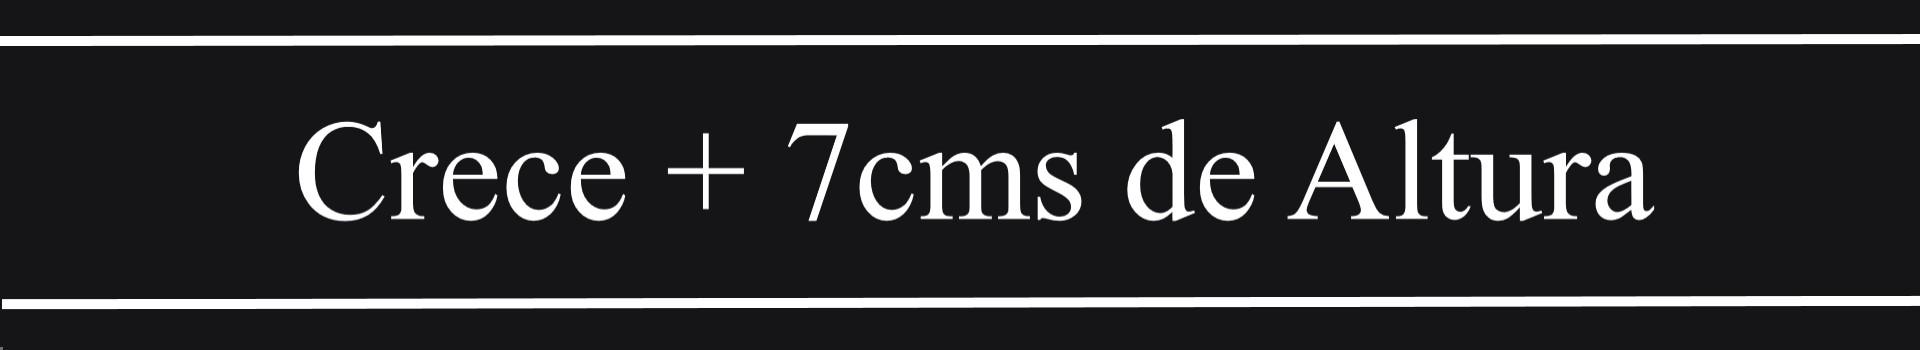 Crece+7cms con Max Denegri